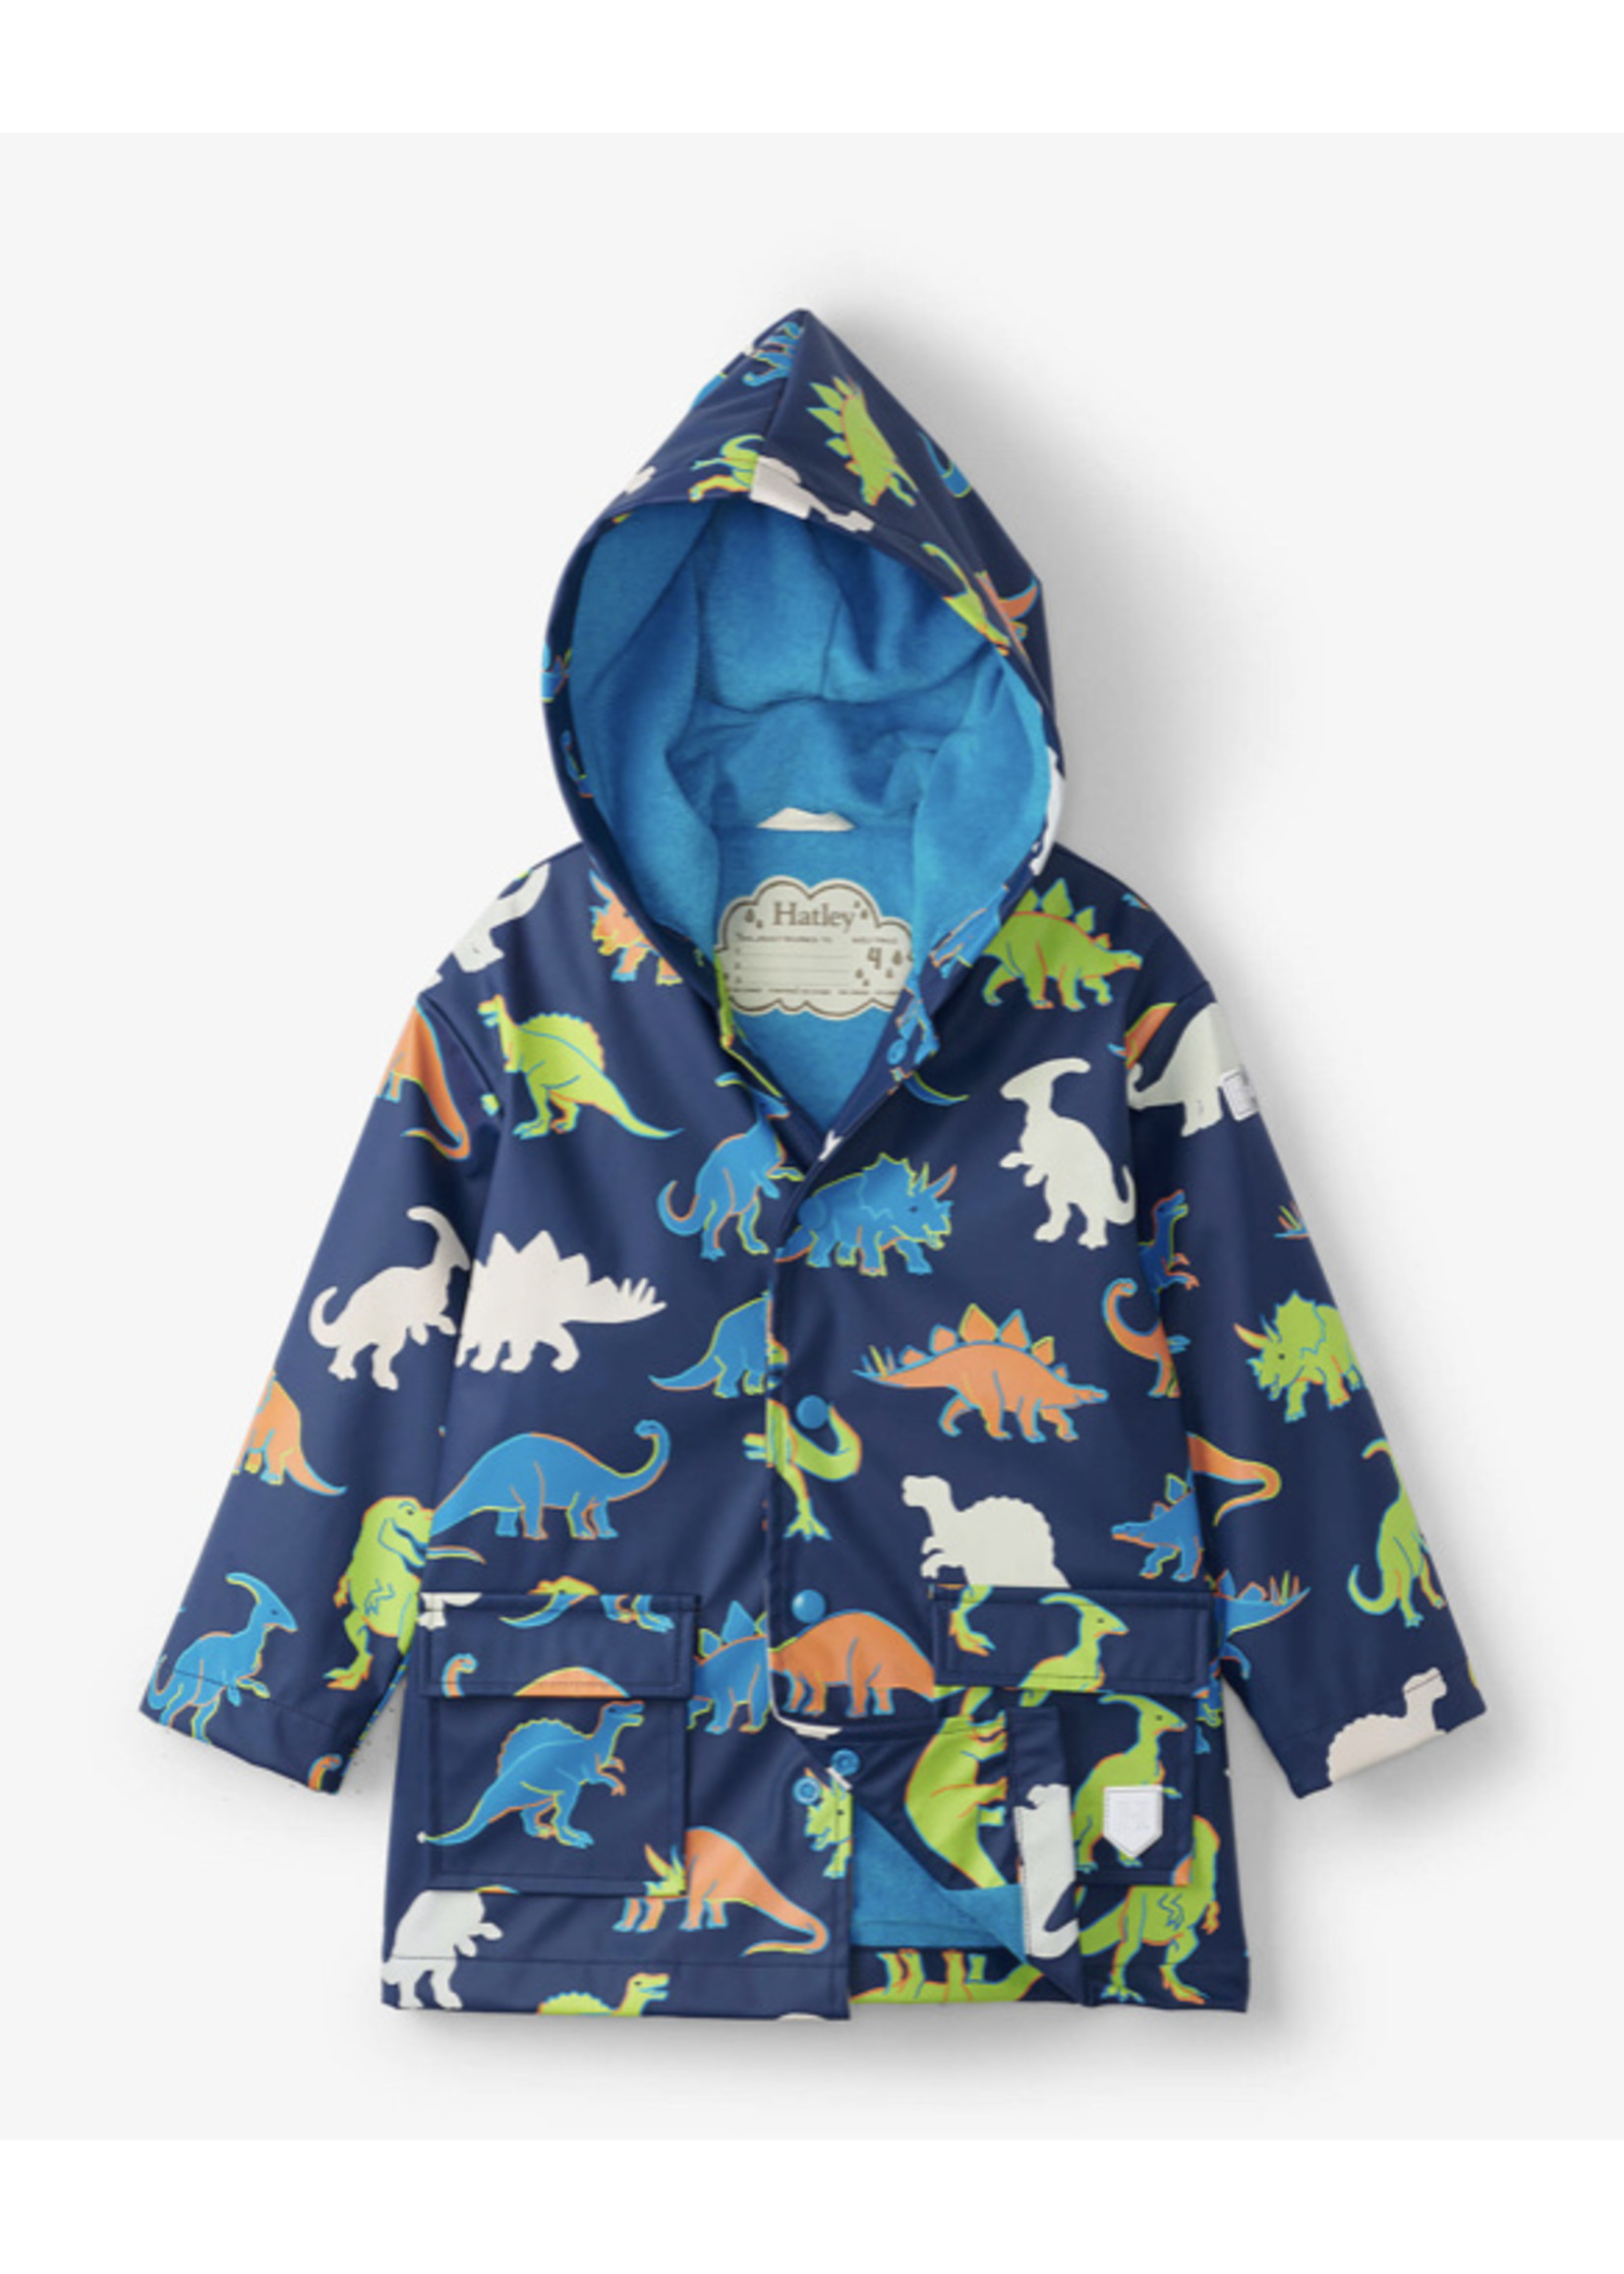 Hatley Dino Colorchanging Raincoat